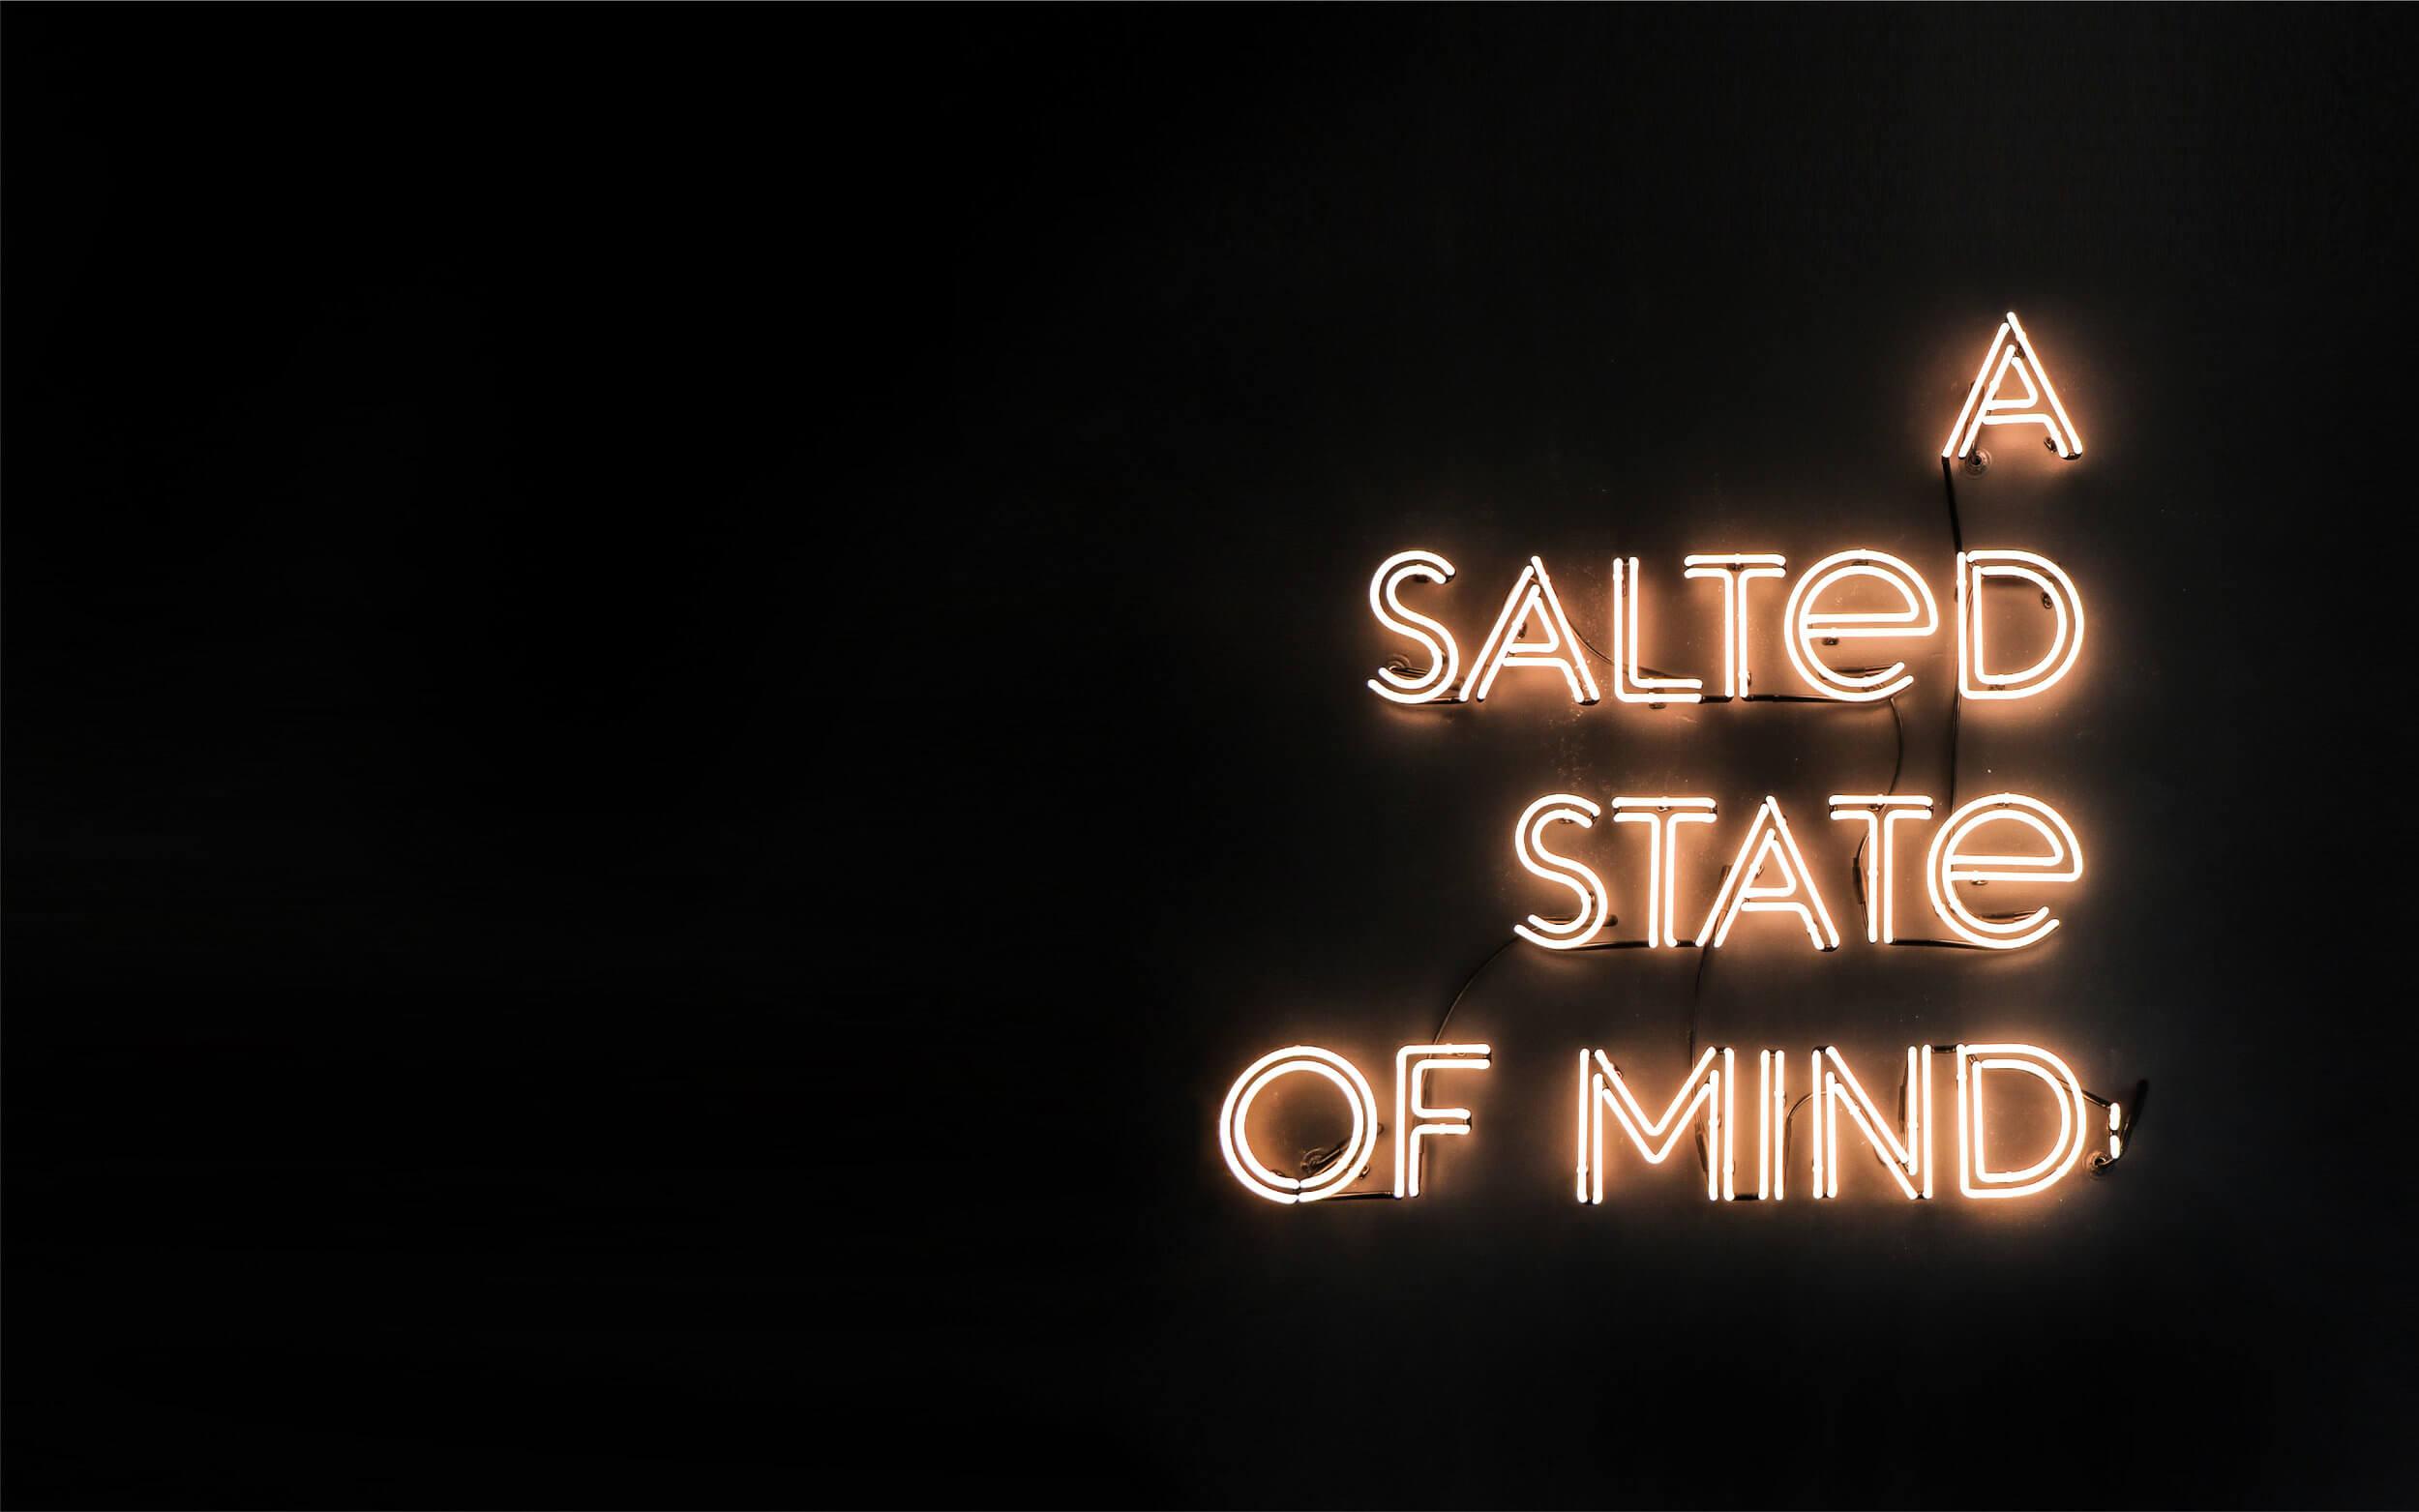 Millie_SaltedCycle_EnviromentalDesign_CustomNeonSign_ASaltedStateOfMind